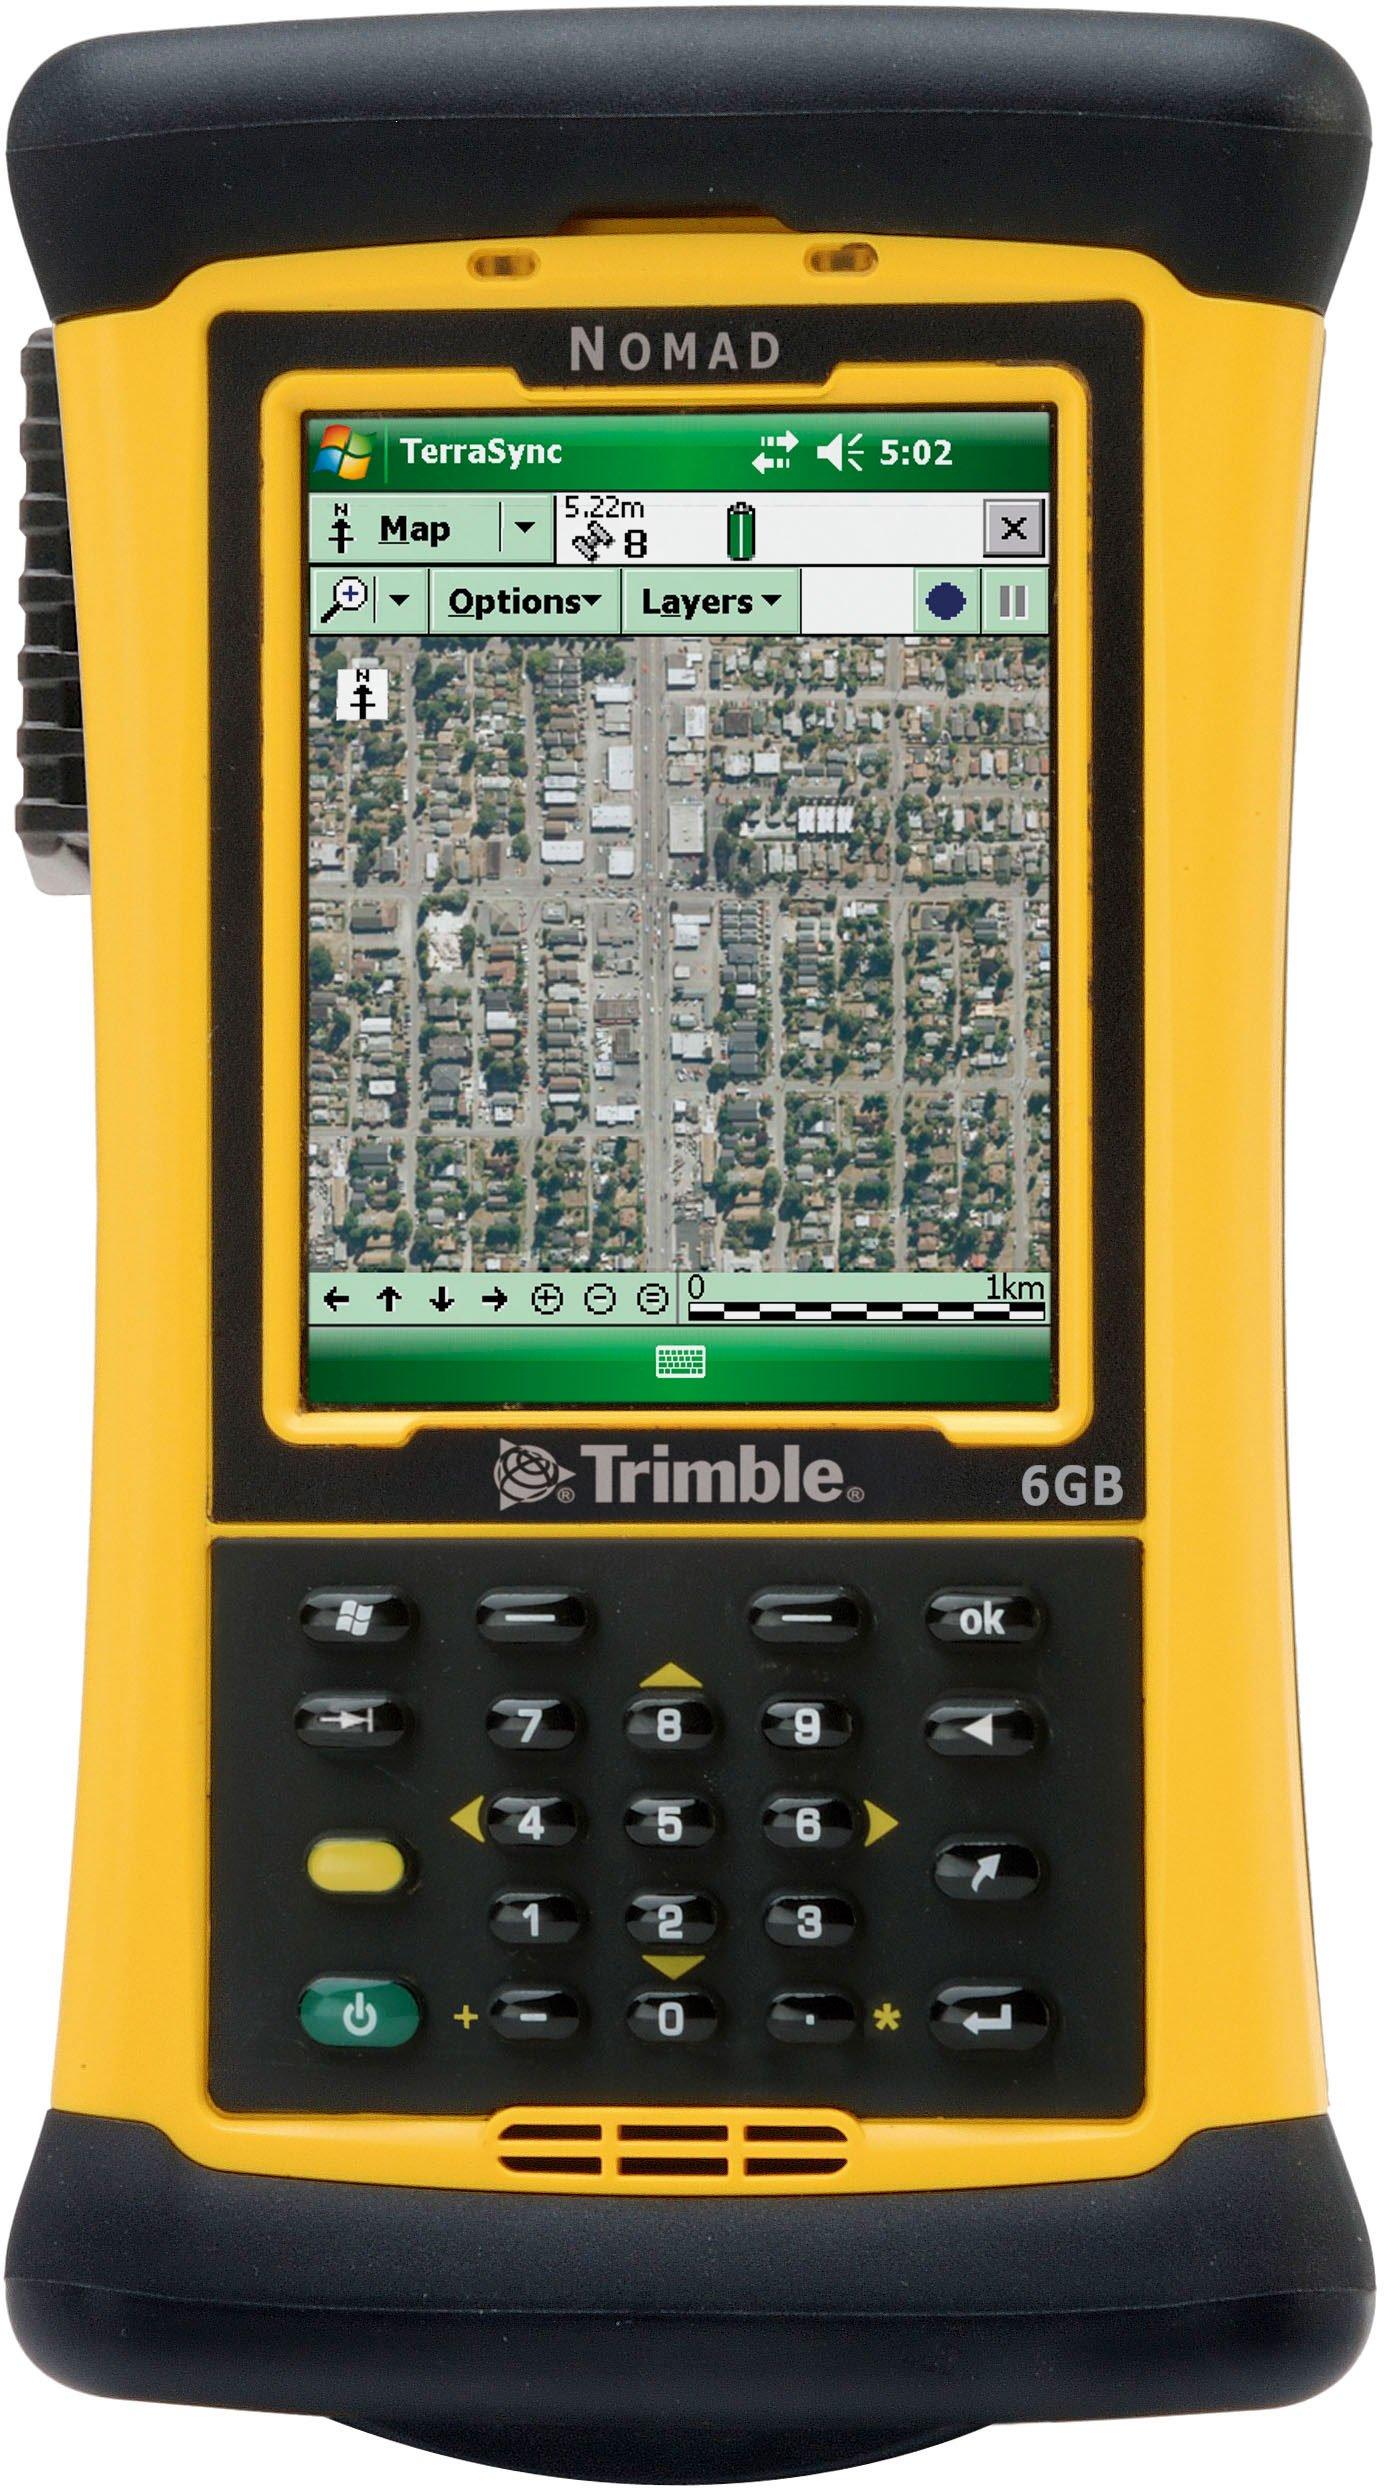 Trimble Navigation Nomad 900B Rugged Handheld Computer Numeric Keypad 806MHz Processor, 128MB RAM/512MB Flash, 5200mAh Lithium-ion Battery NMDAAG-111-00 by Trimble Navigation